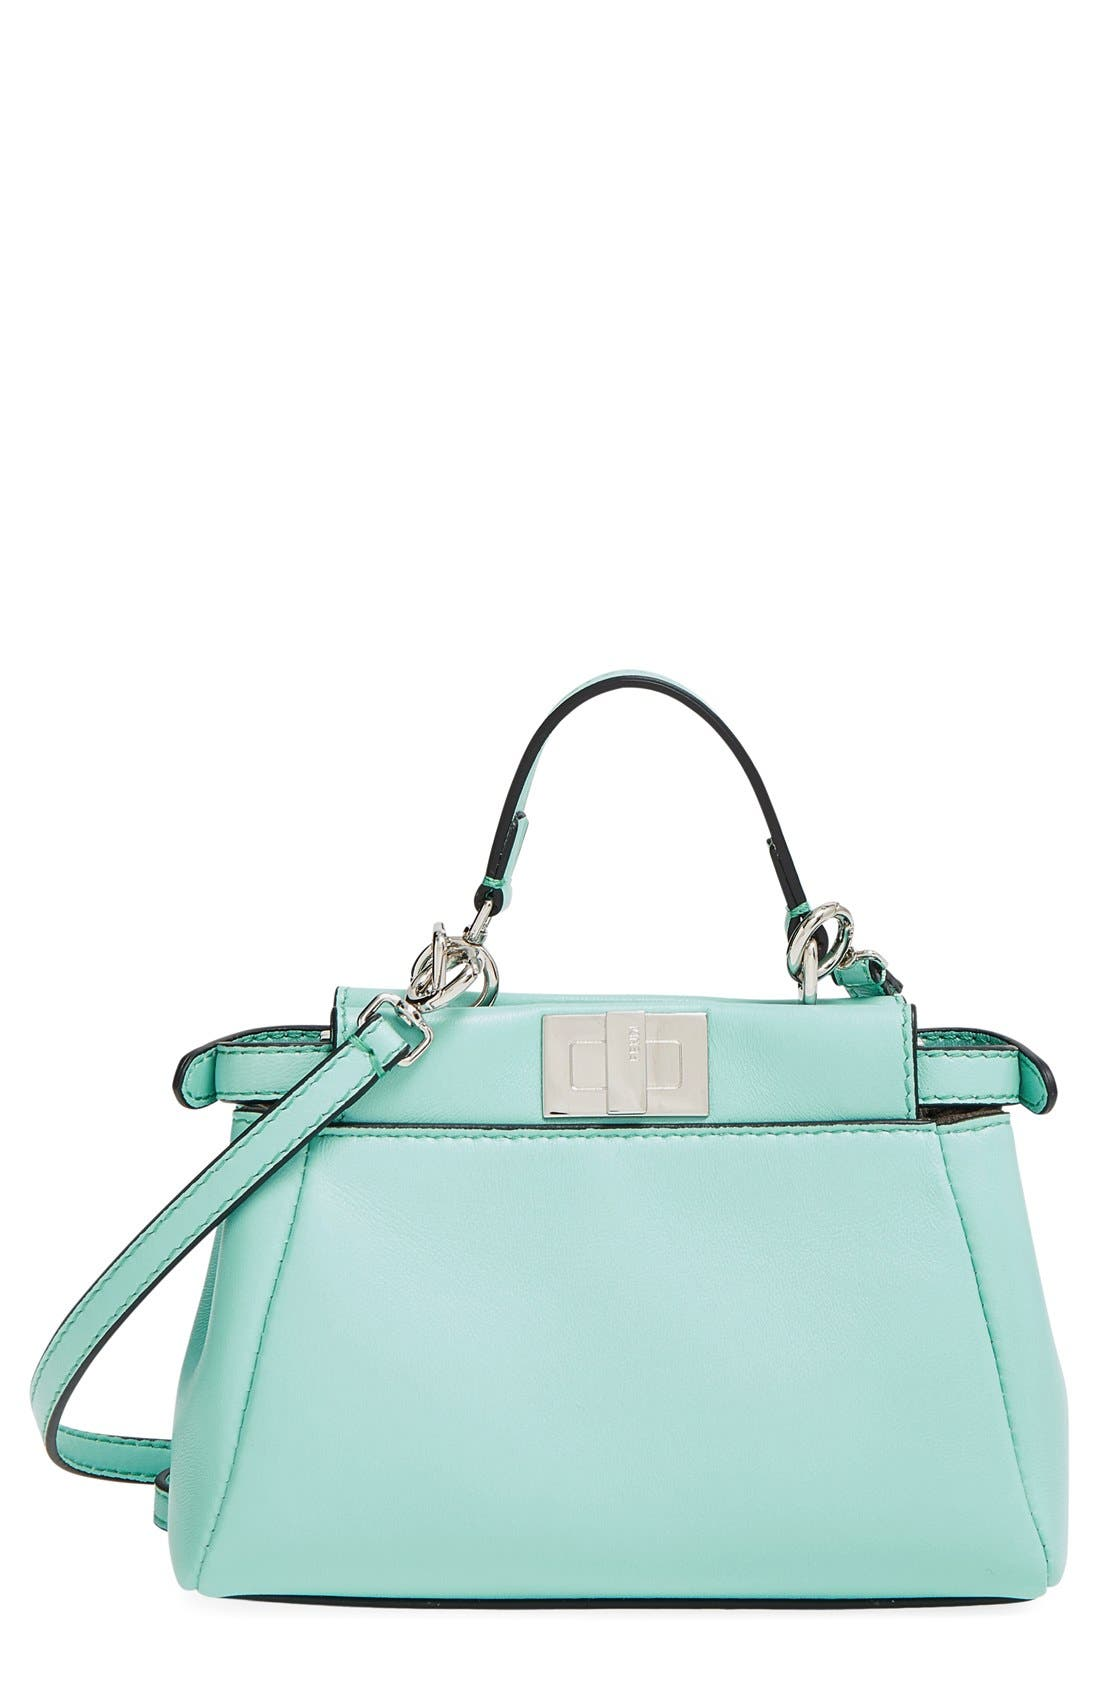 Alternate Image 1 Selected - Fendi 'Micro Peekaboo' Nappa Leather Bag